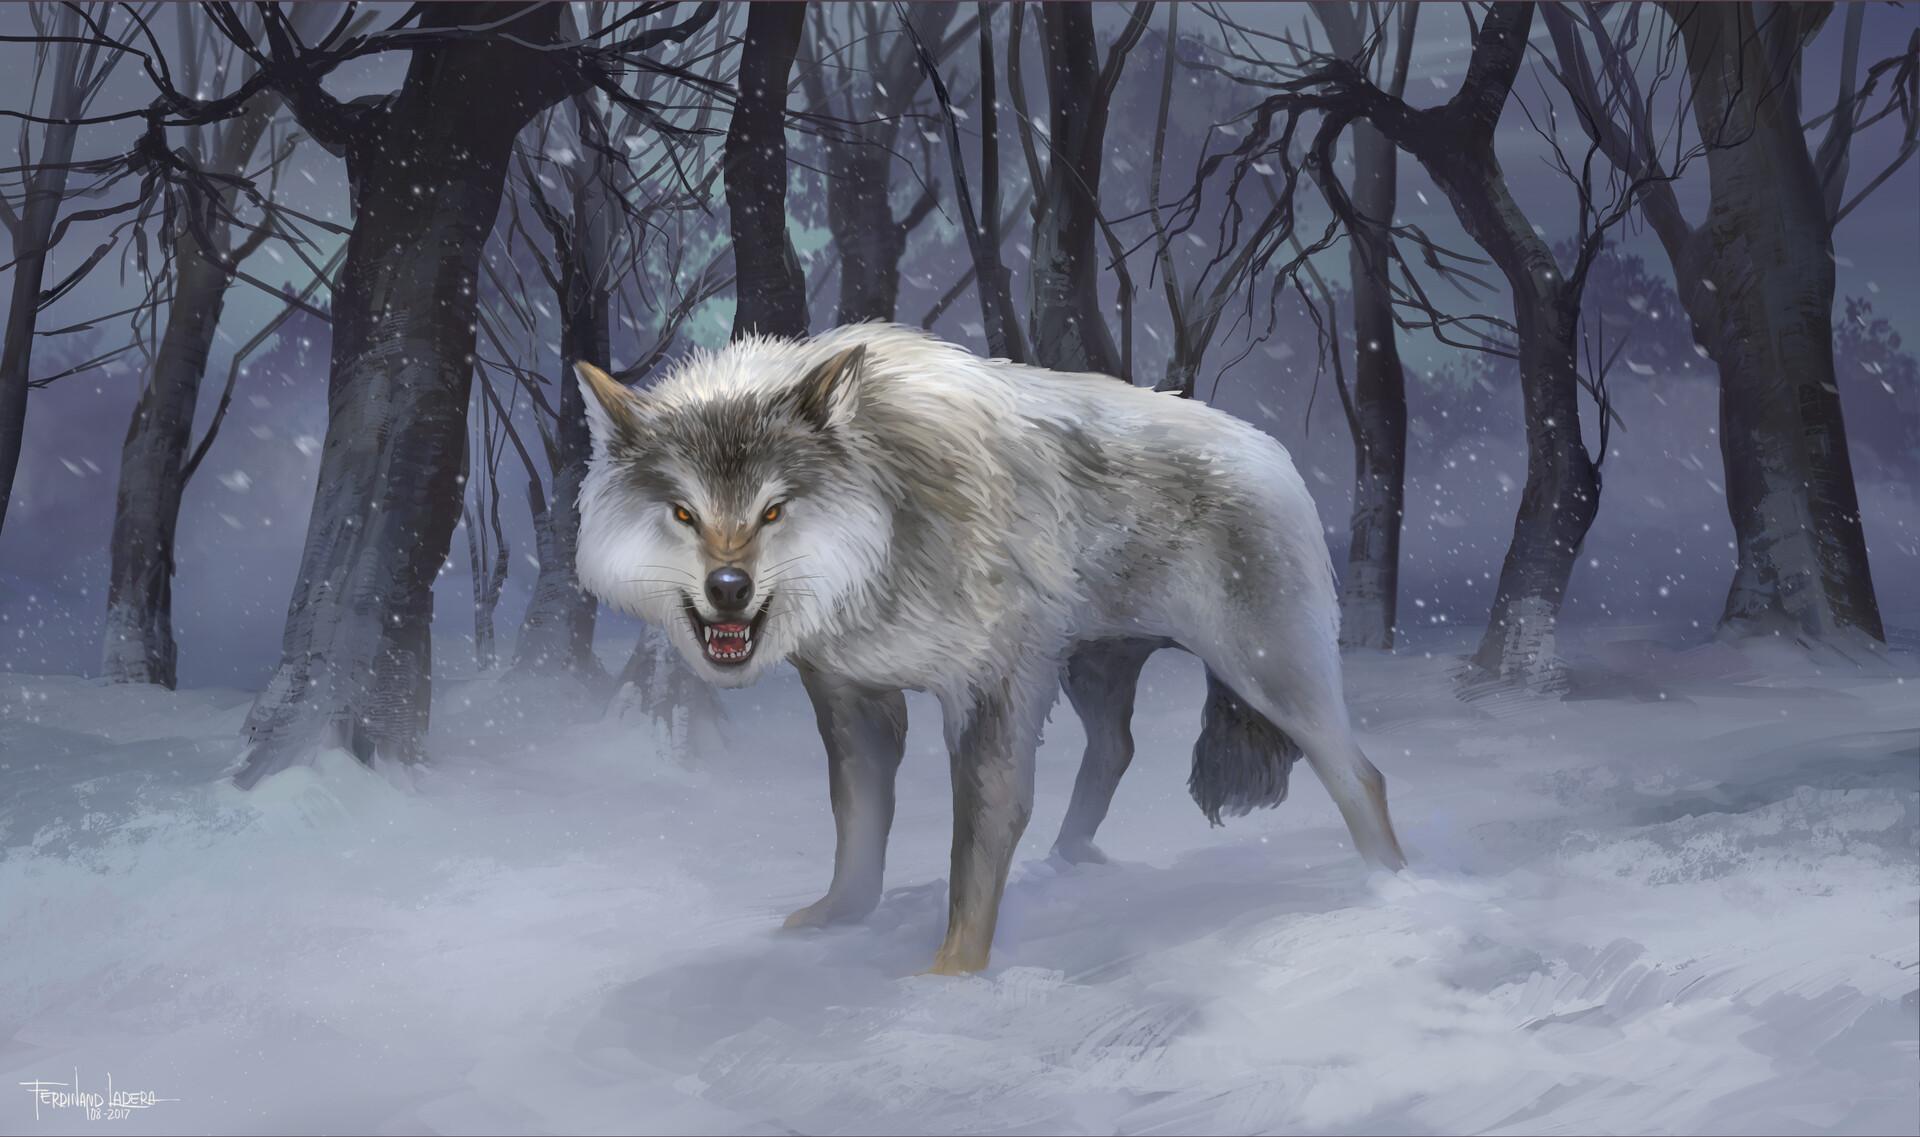 Ferdinand ladera wolf